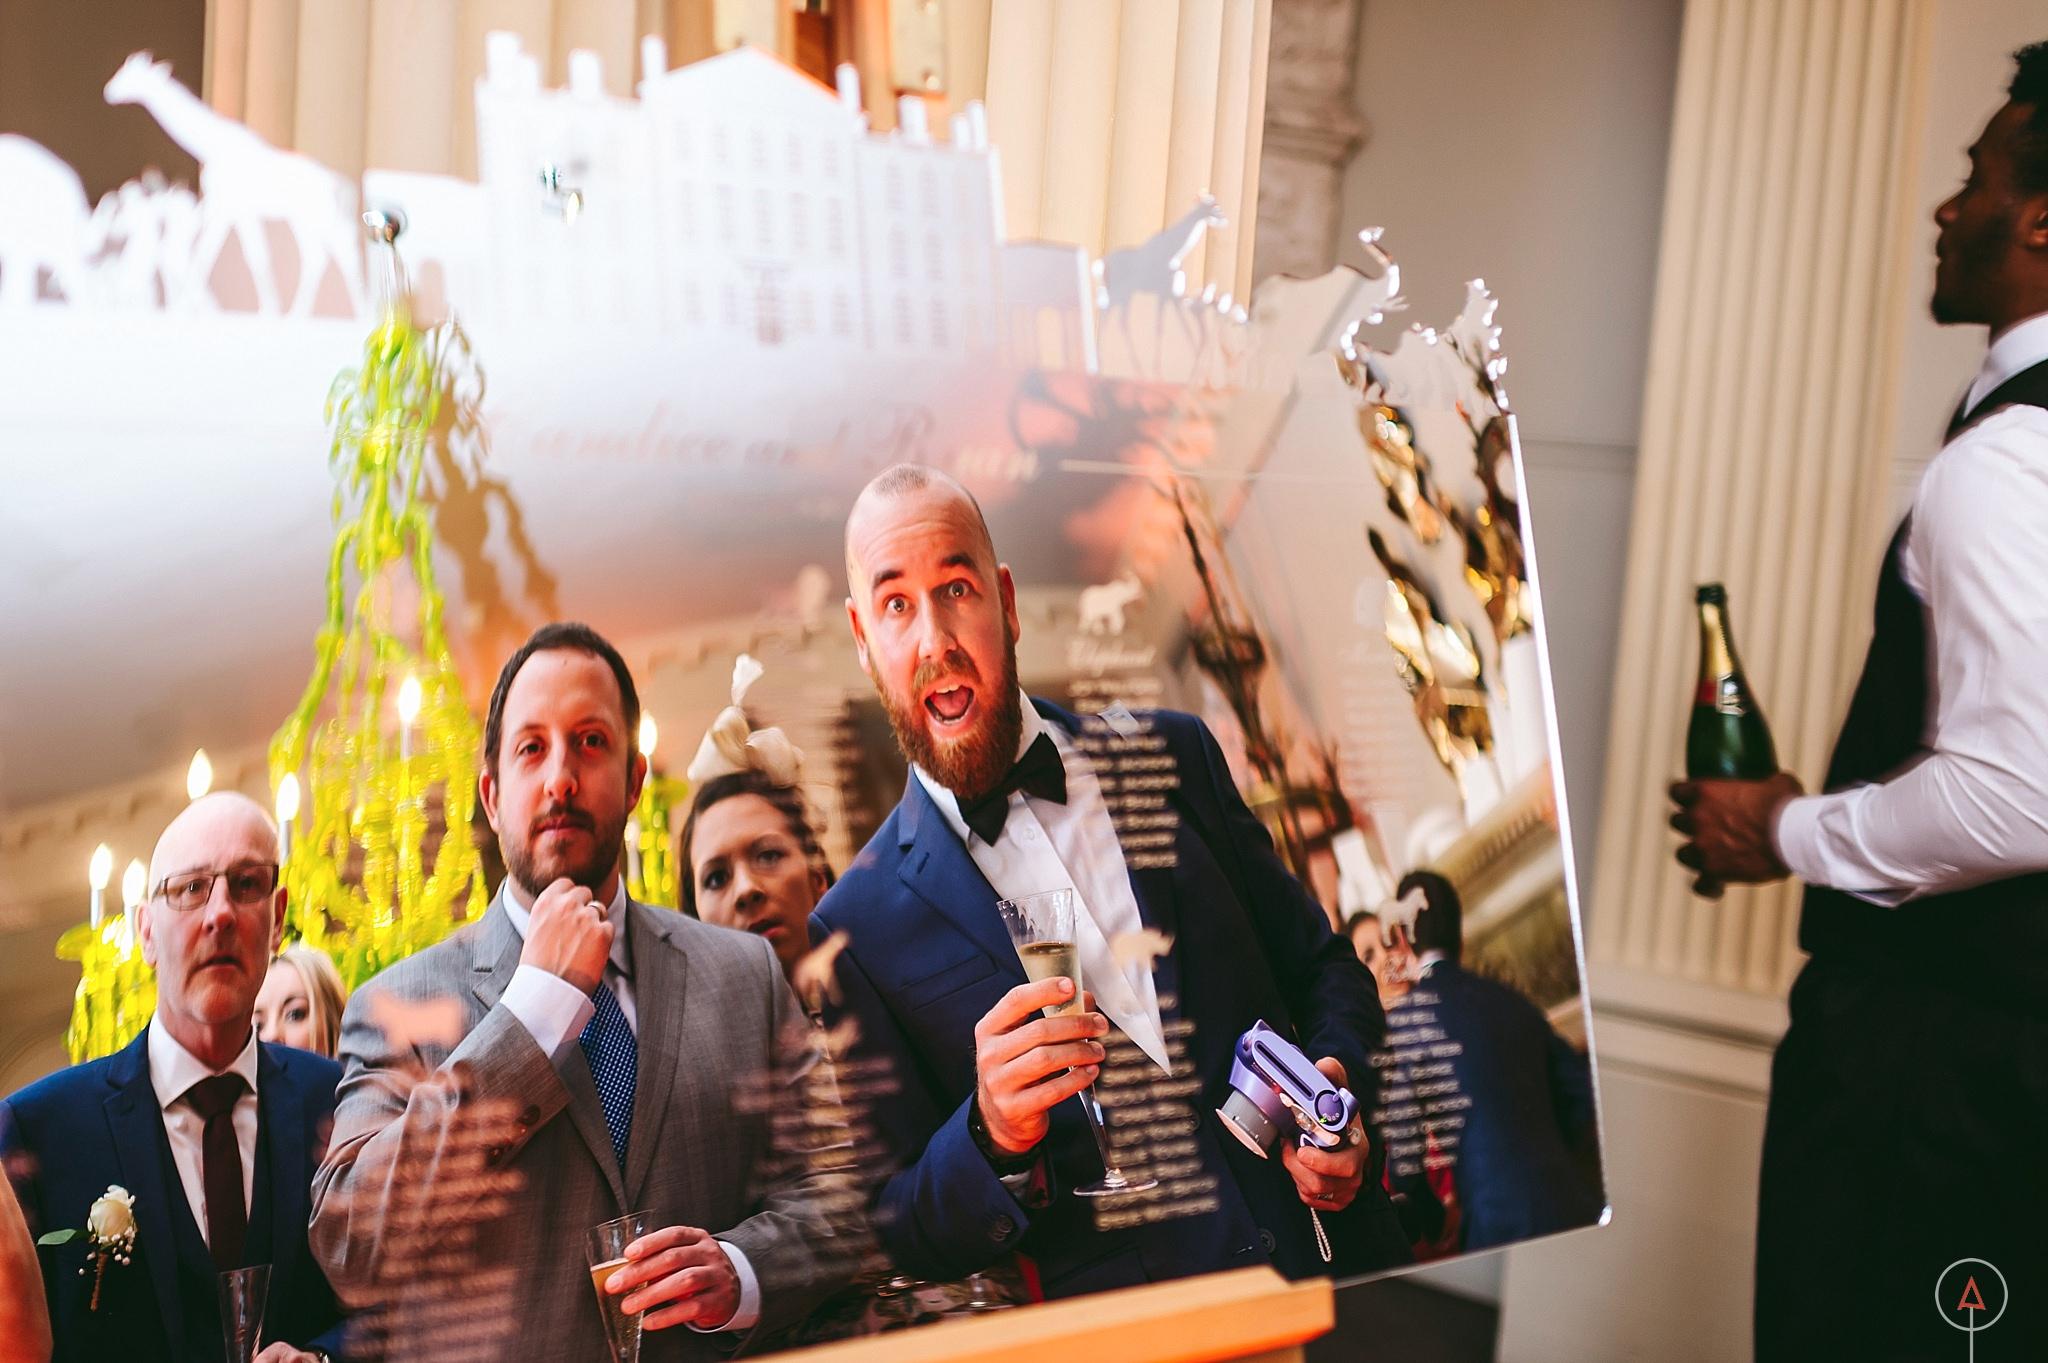 cardiff-wedding-photographer-aga-tomaszek_0263